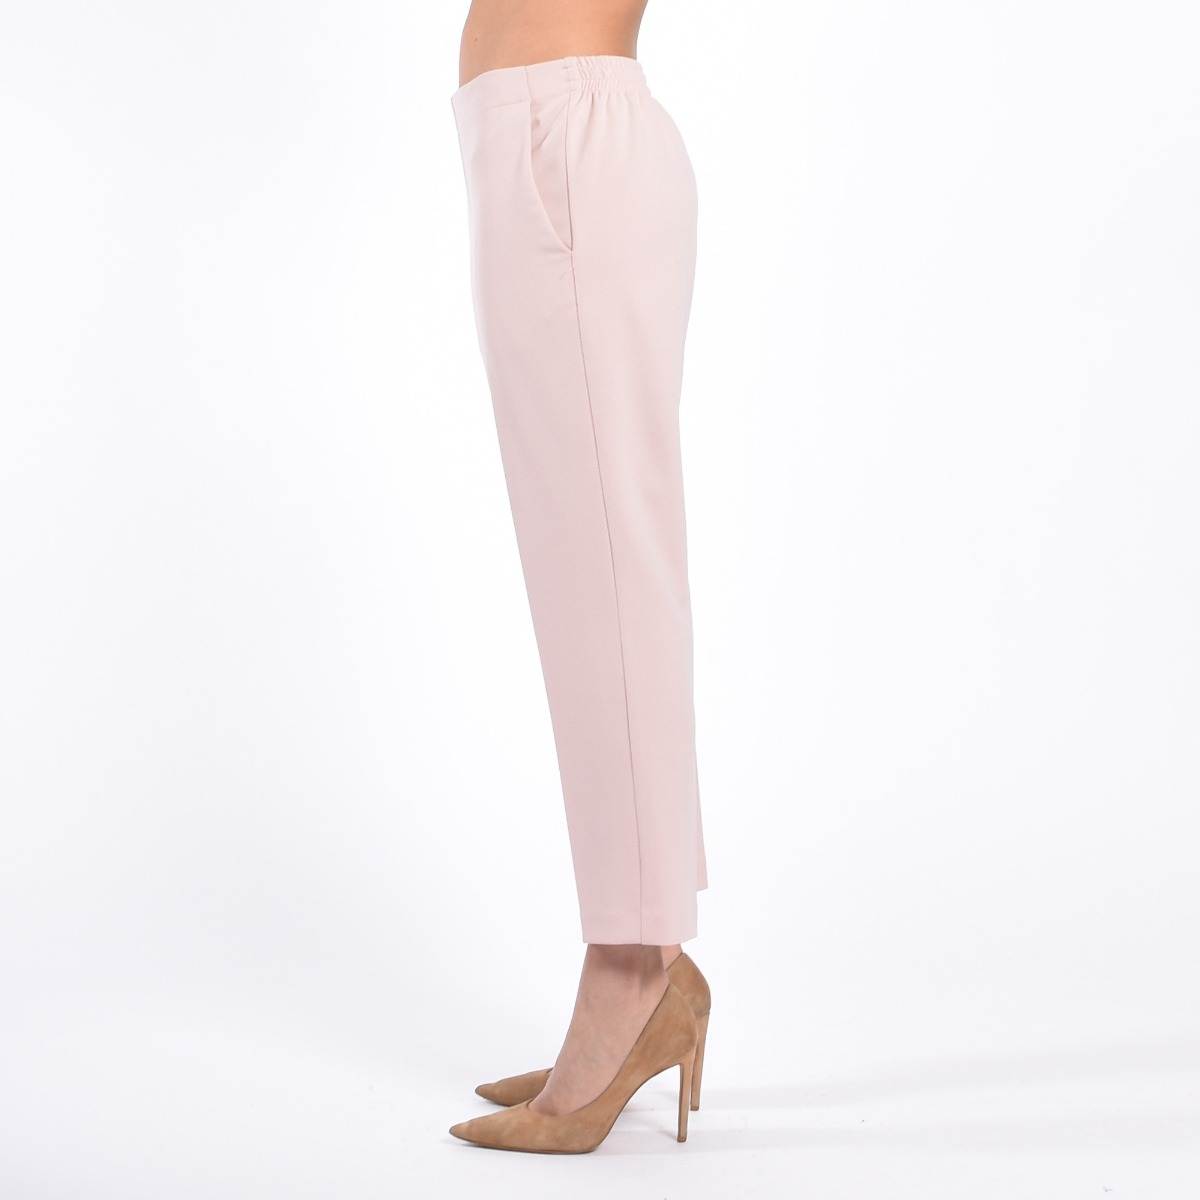 Pantalone elastico- Cipria